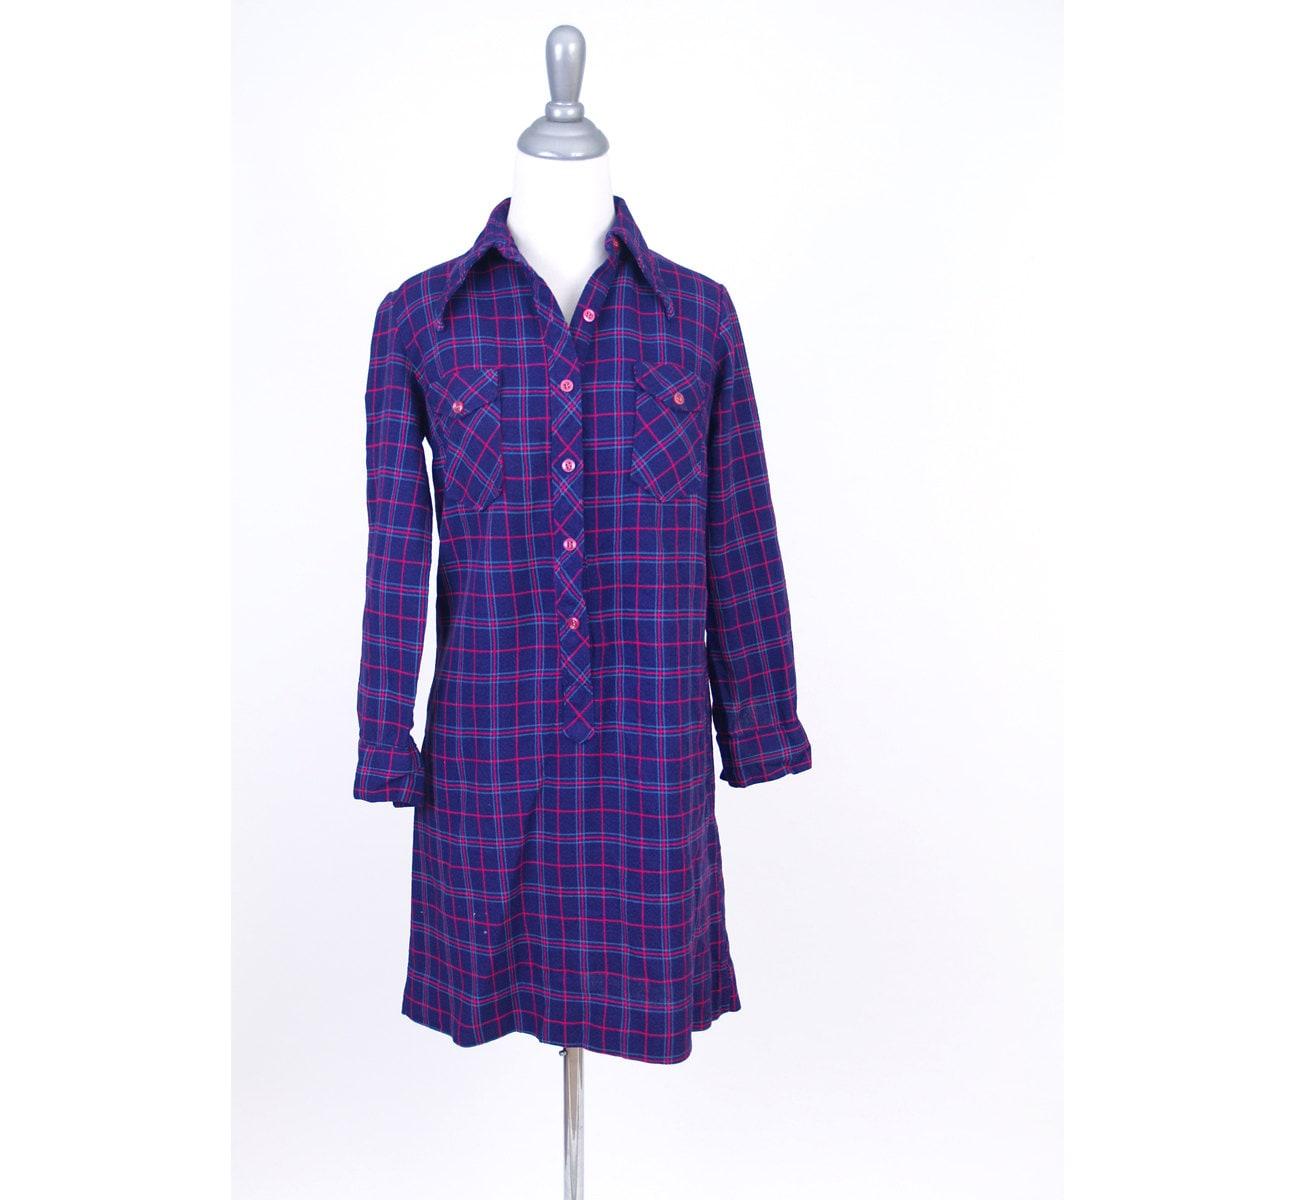 Purple Plaid Shirt Dress S M Grape Pink Blue The Art Shirt